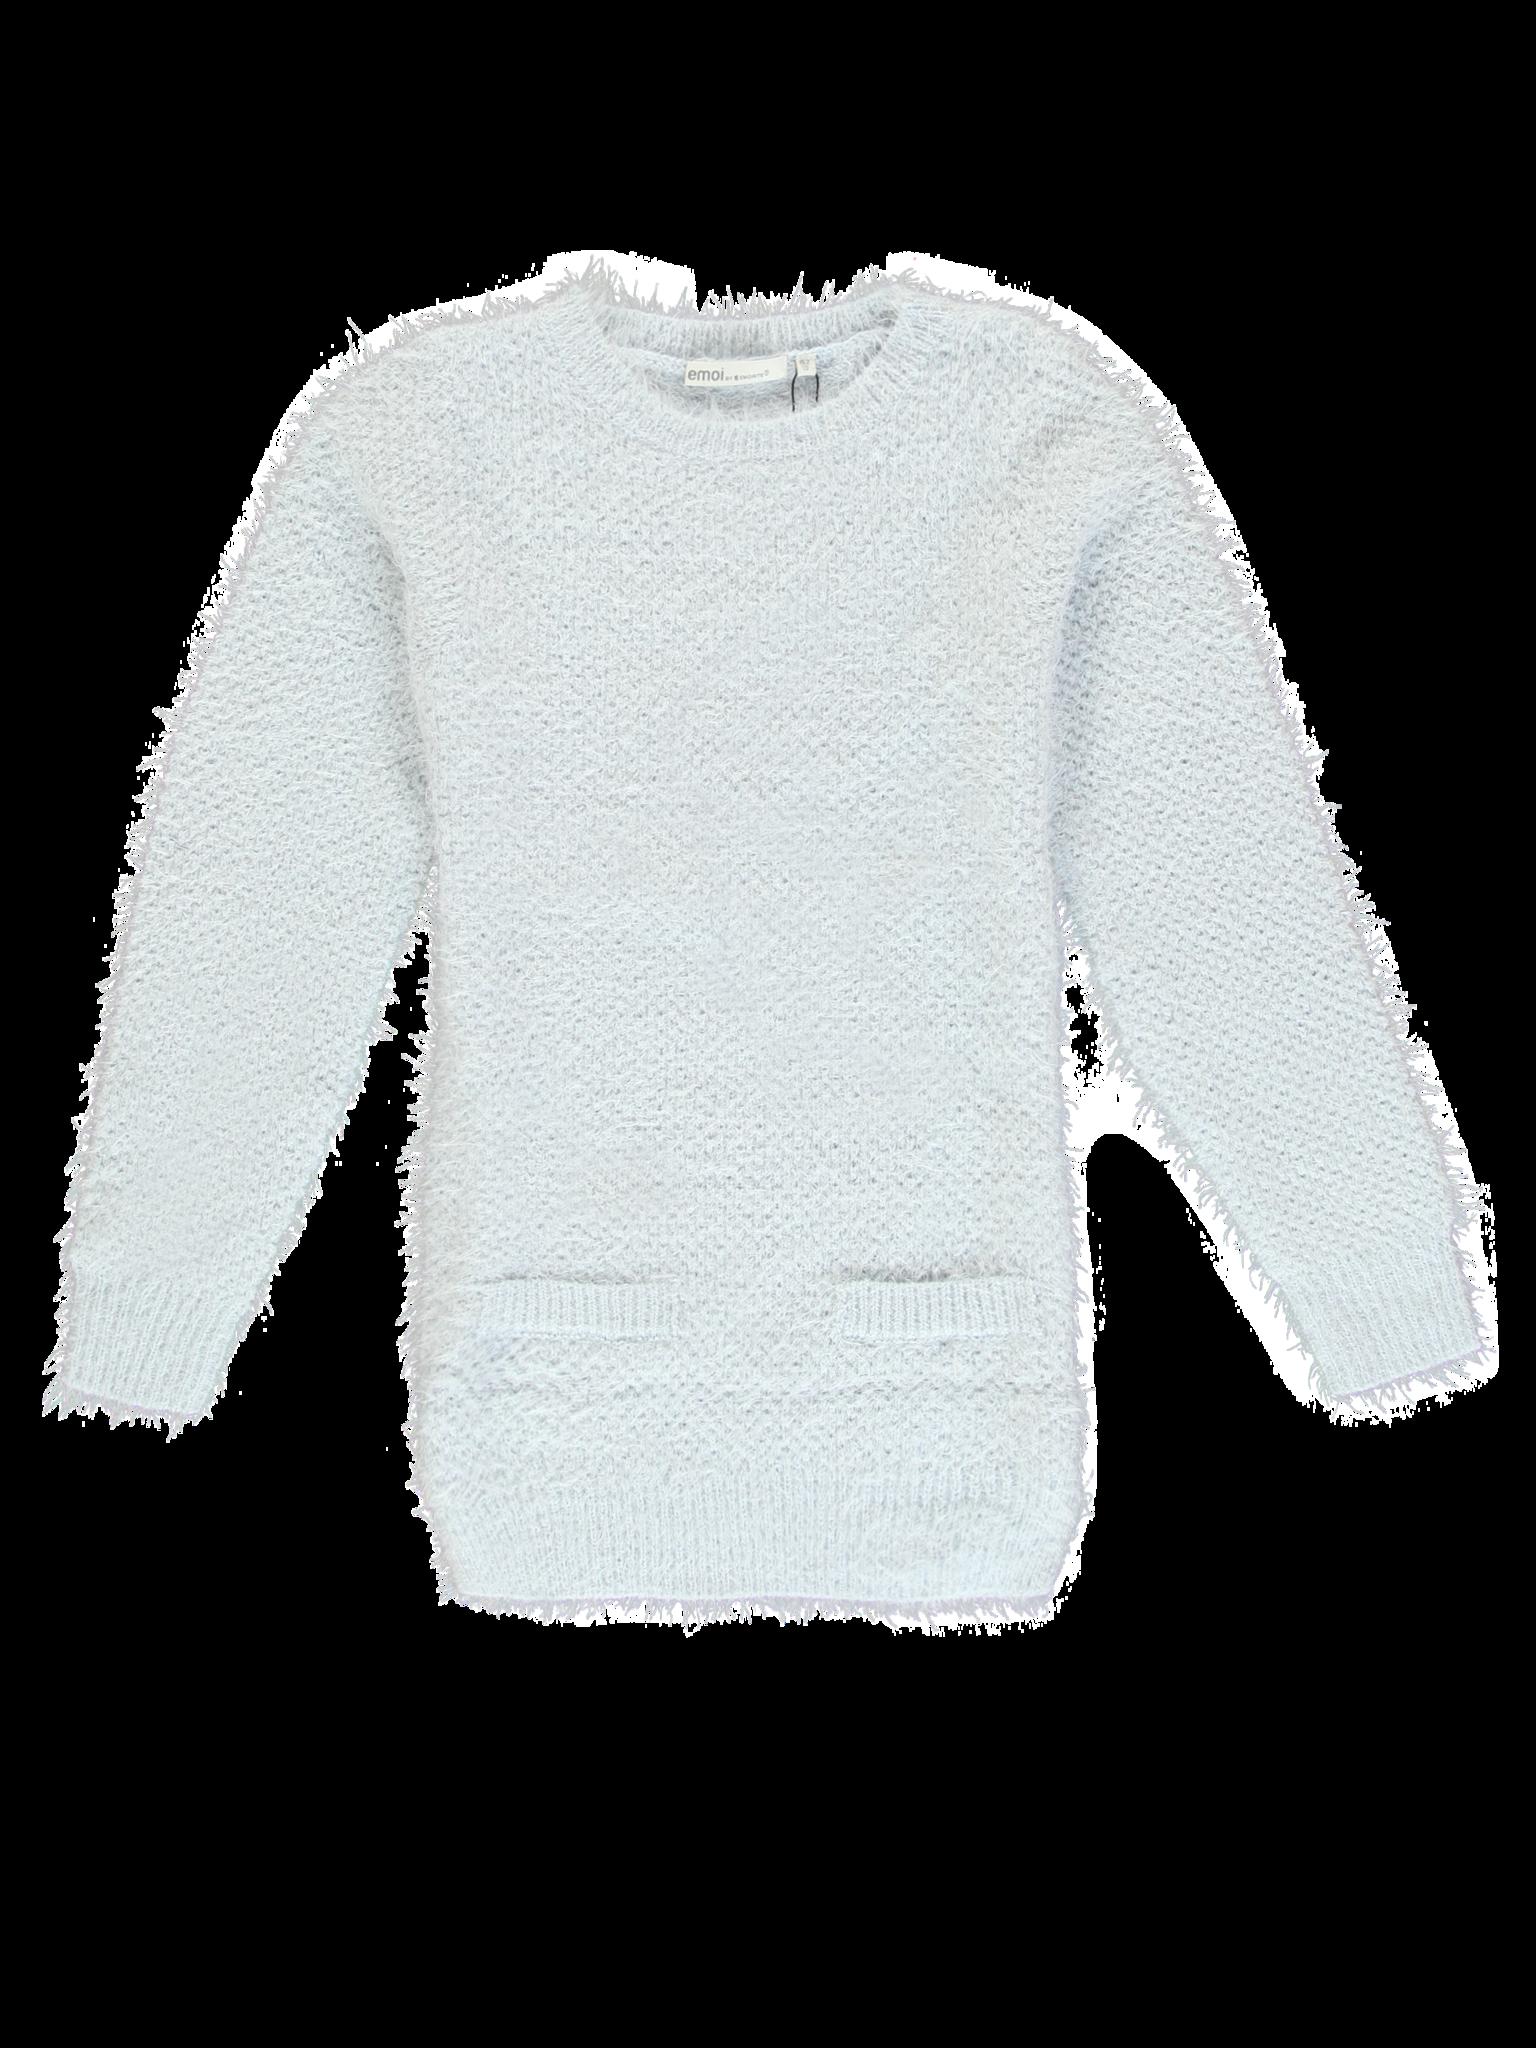 All Brands | Winterproducts Teen Girls | Pull | 24 pcs/box